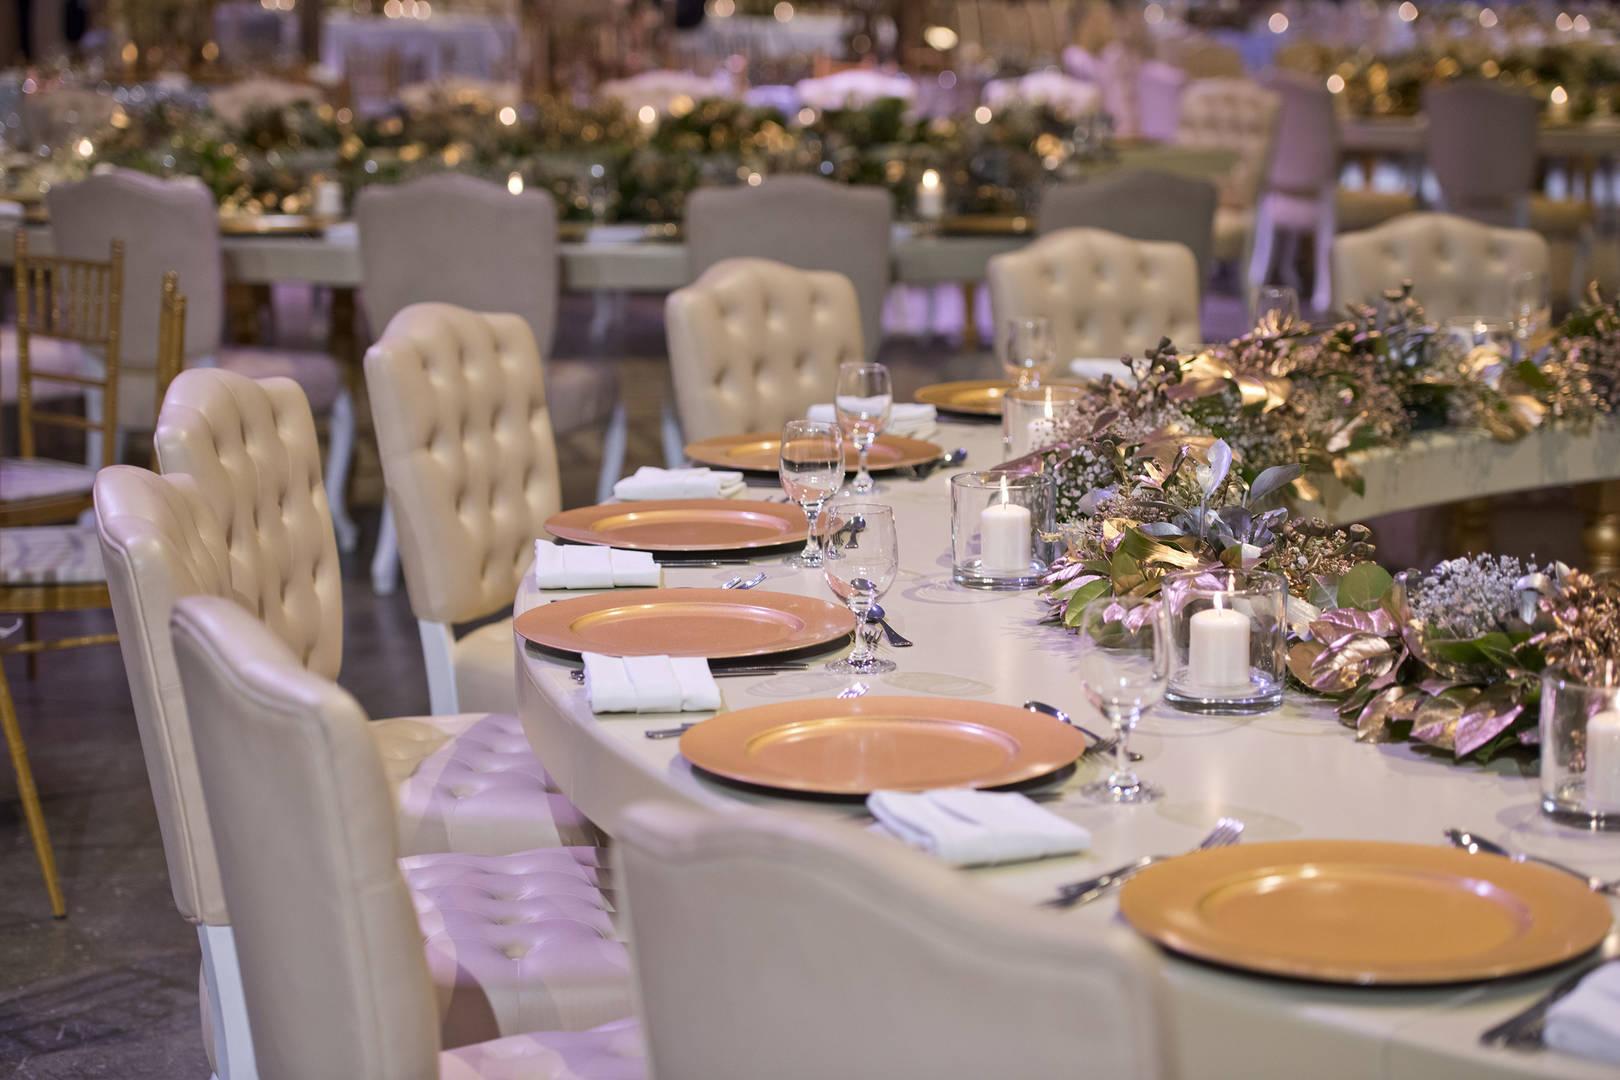 https://cdn.jumeirah.com/-/mediadh/DH/Hospitality/Jumeirah/Occasion/Dubai/Burj-Al-Arab/Al-Naseem-Al-Qasr-Dar-Al-Masyaf-A-Salam/Dinning/6-4/Madinat-Jumeirah-Madinat-Arena-Wedding-Event-6-4.jpg?h=1080&w=1620&hash=2BCE78940996EAD2E8DE4036A5A9C7DA